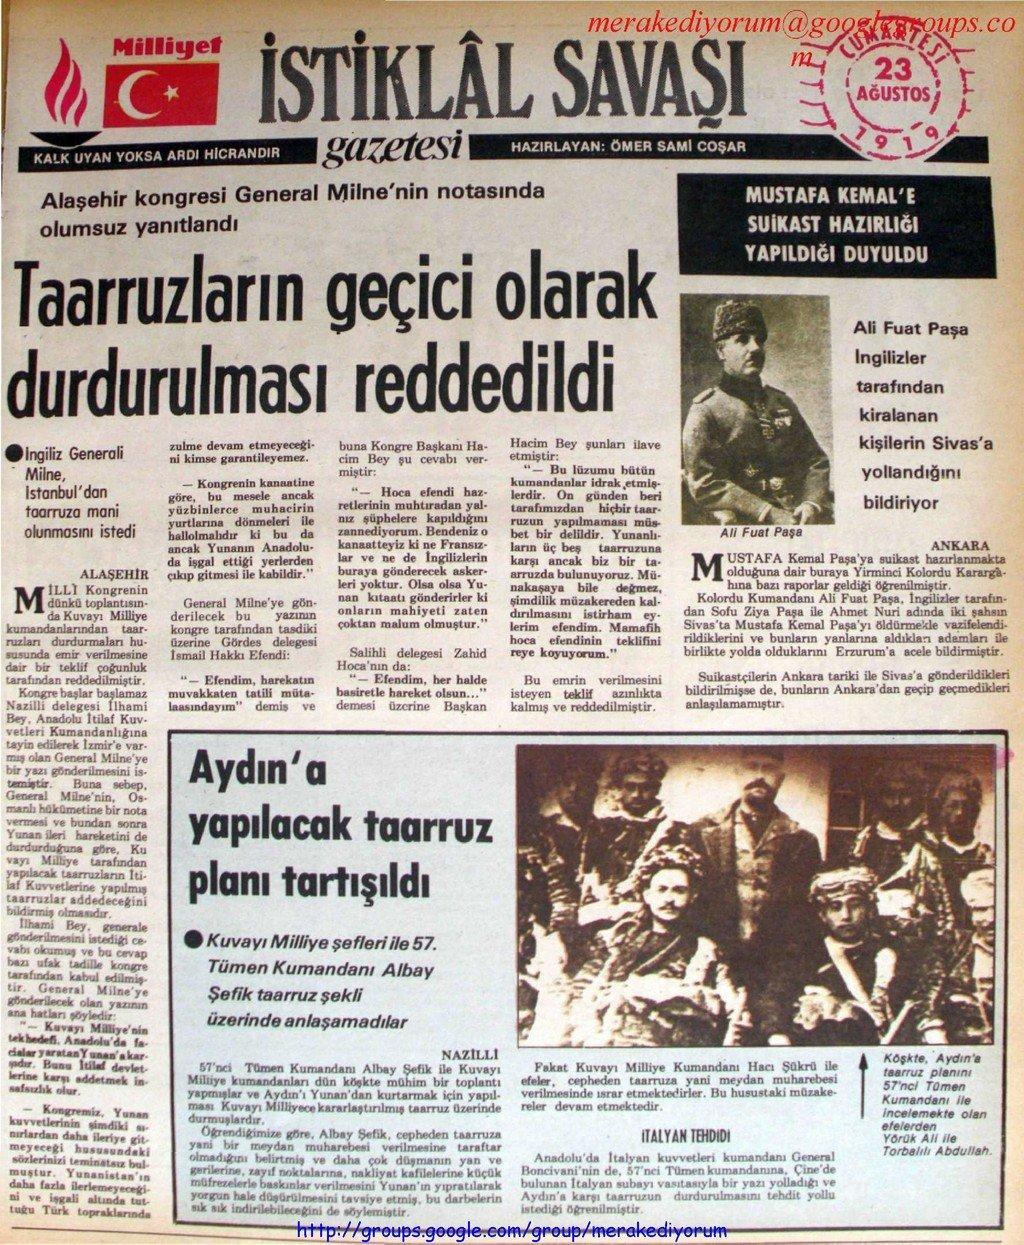 istiklal savaşı gazetesi - 23 ağustos 1919